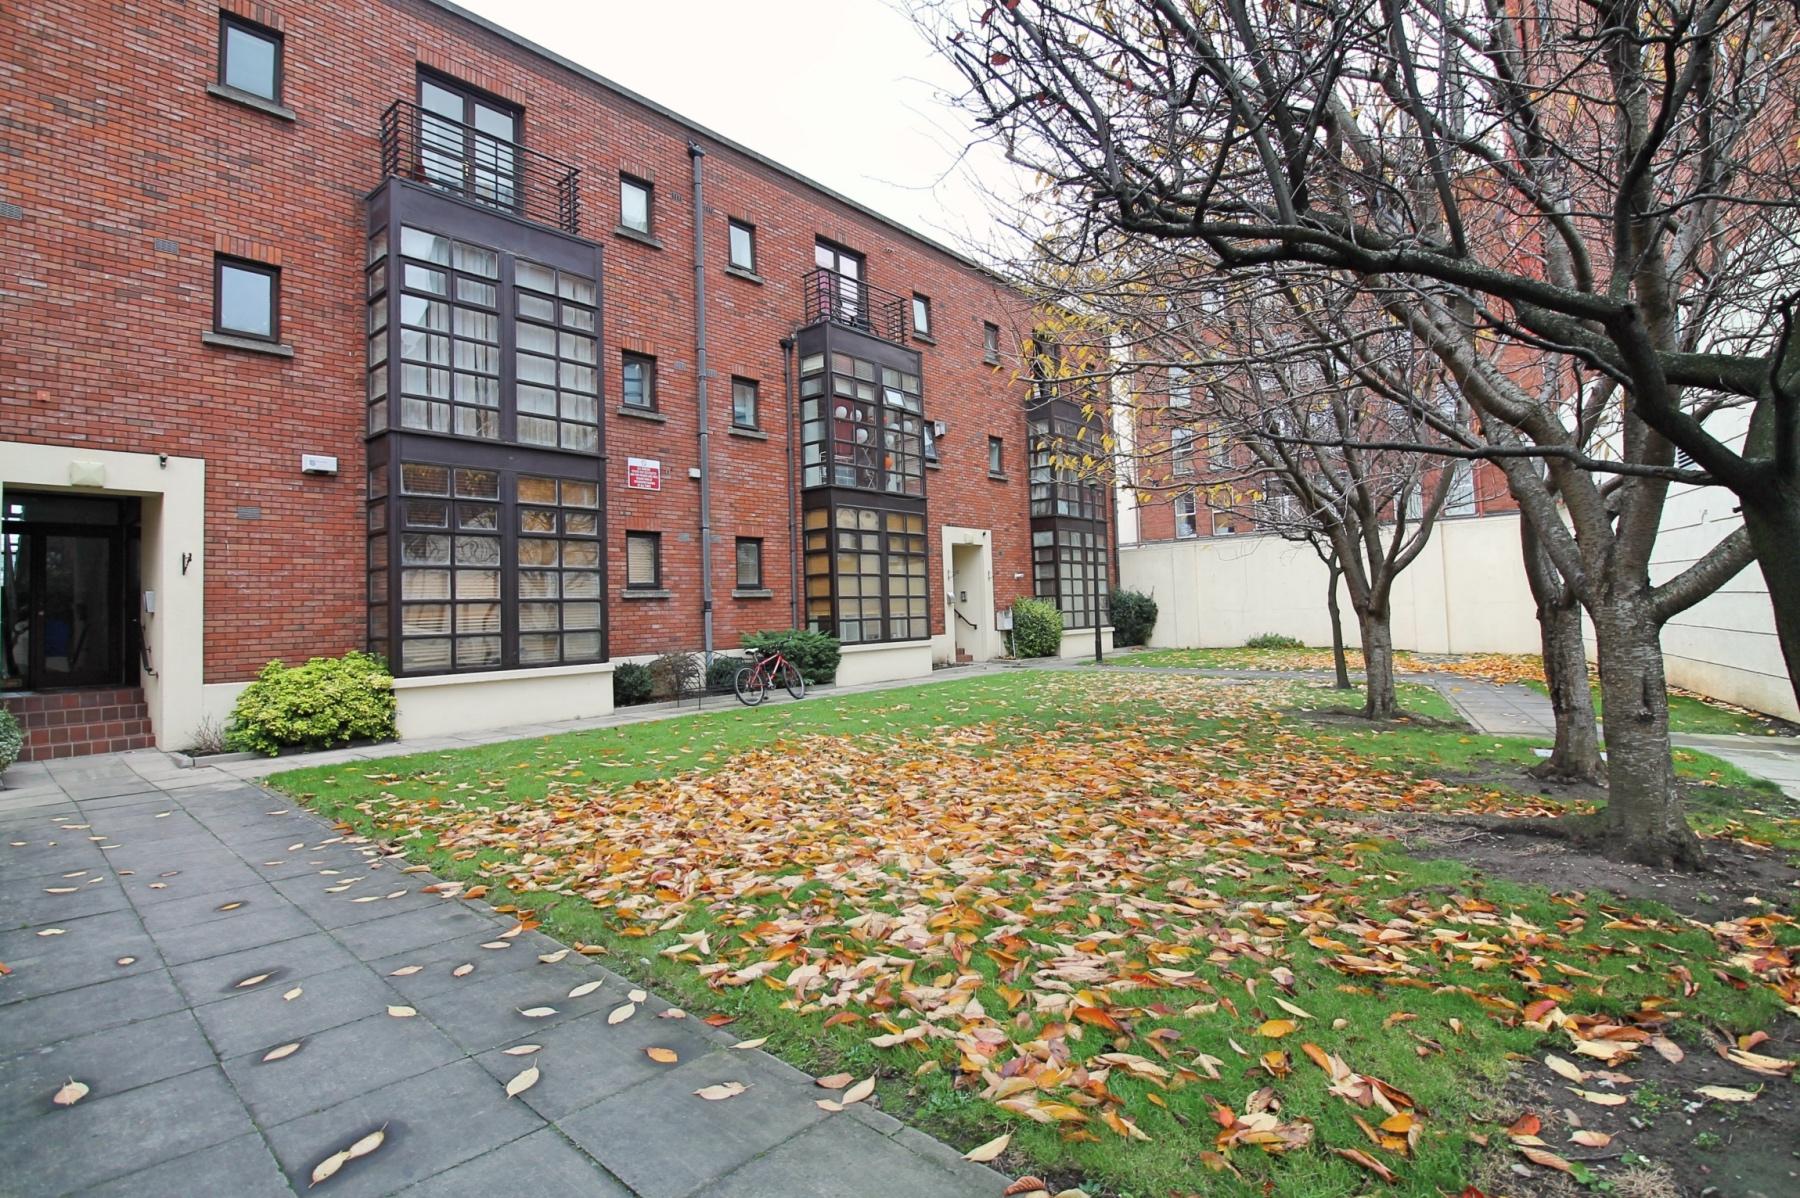 Apartment To Let – Dublin 7 – 28 Sarsfield Quay, Liffey Street West